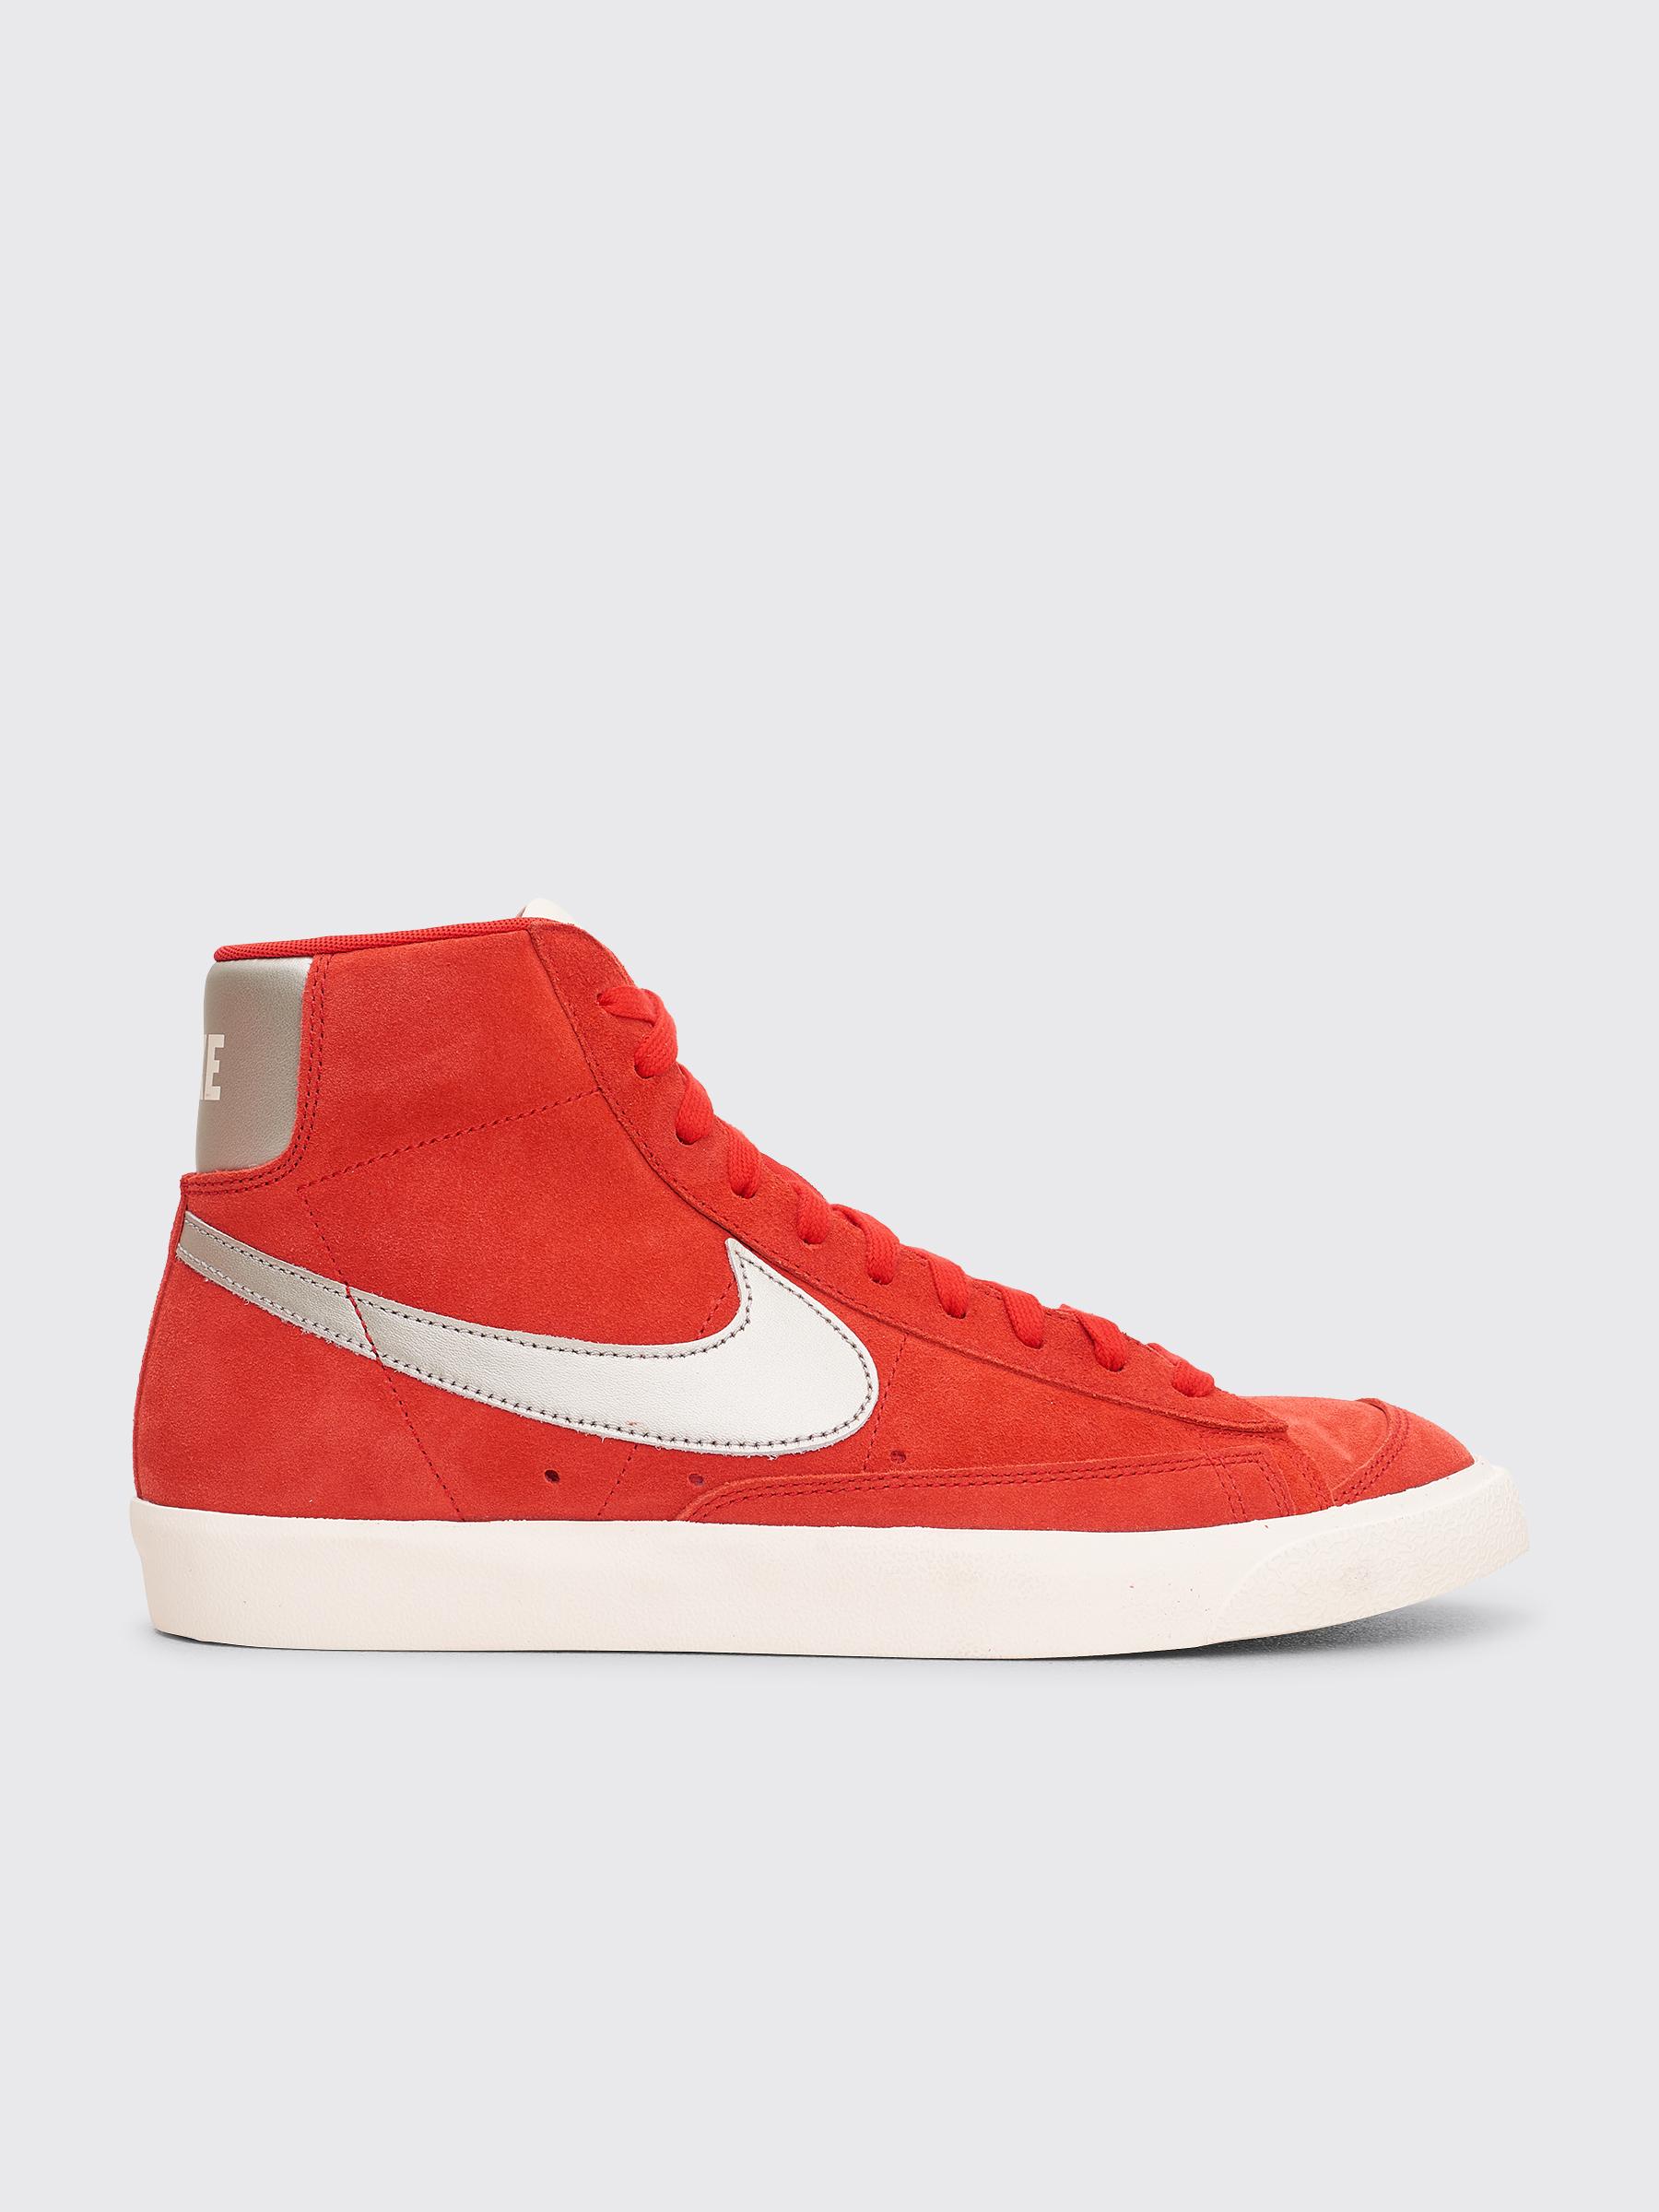 Nike Blazer '77 Shoes University Red Metallic Silver